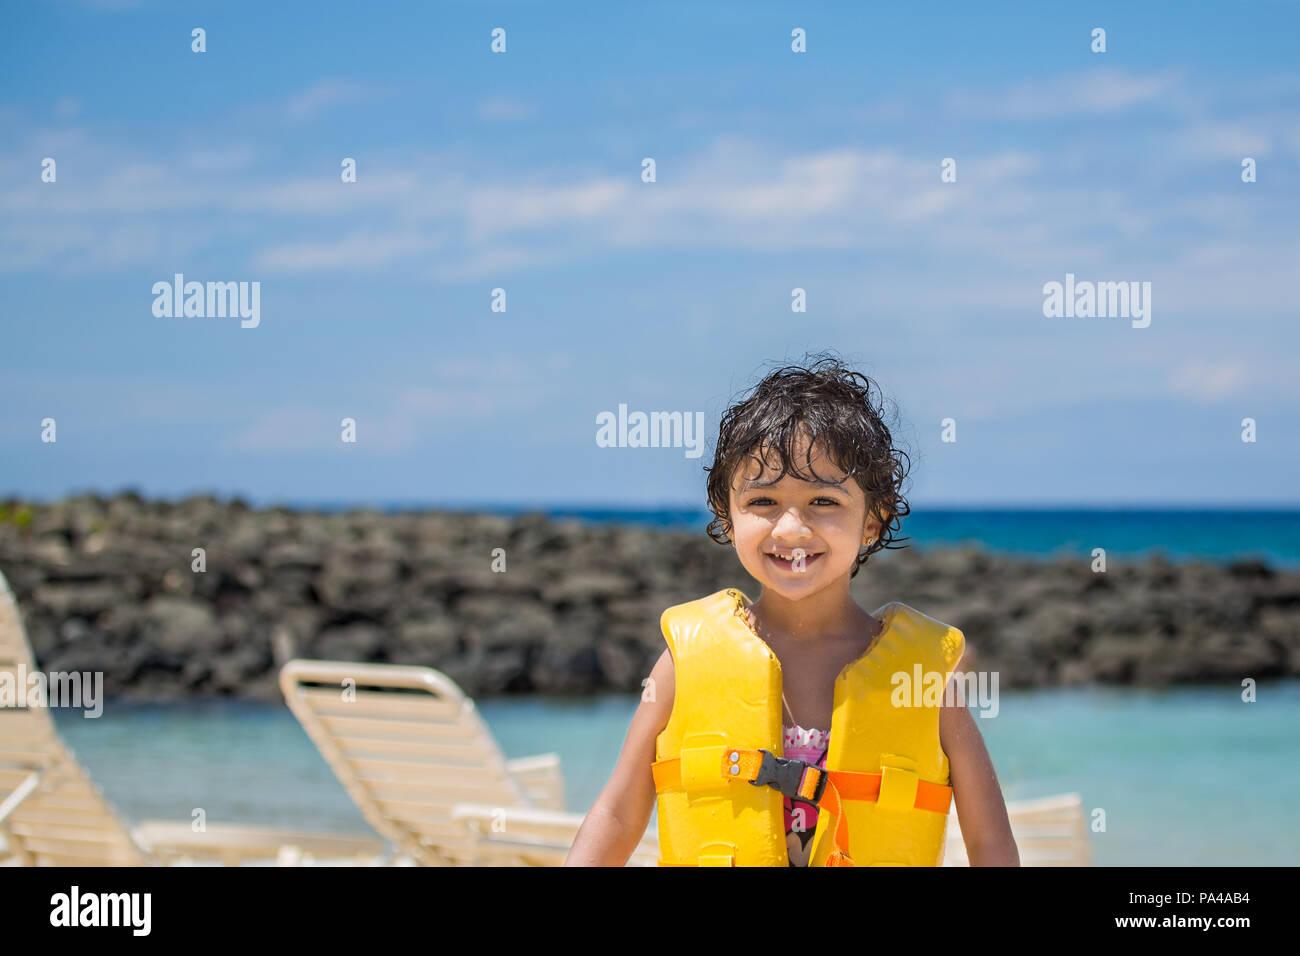 Little Girl In a Life Vest on an Ocean Beach - Stock Image